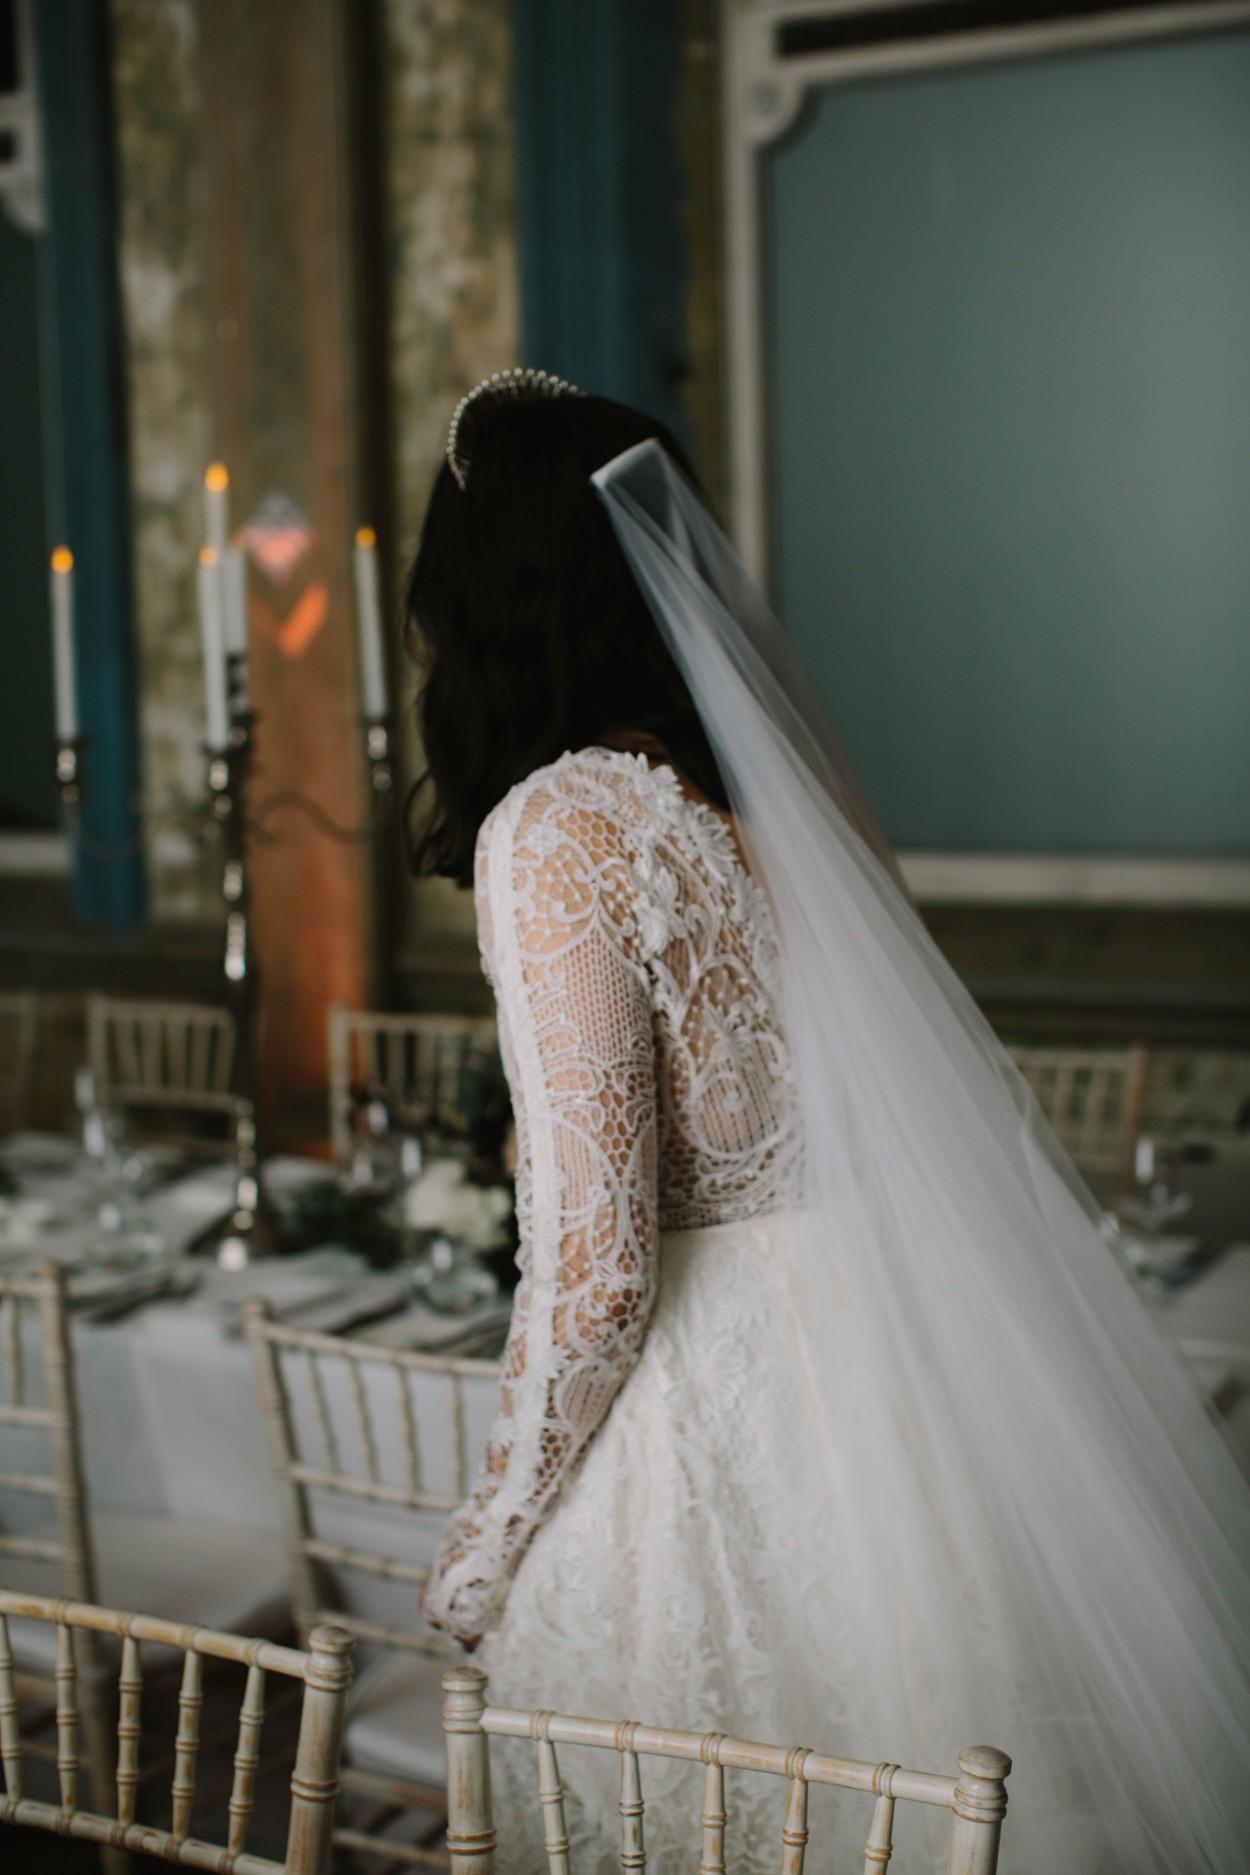 I-Got-You-Babe-Weddings-The-097George-Ballroom-St-Kilda-Wedding-Amy-Abhi.jpg